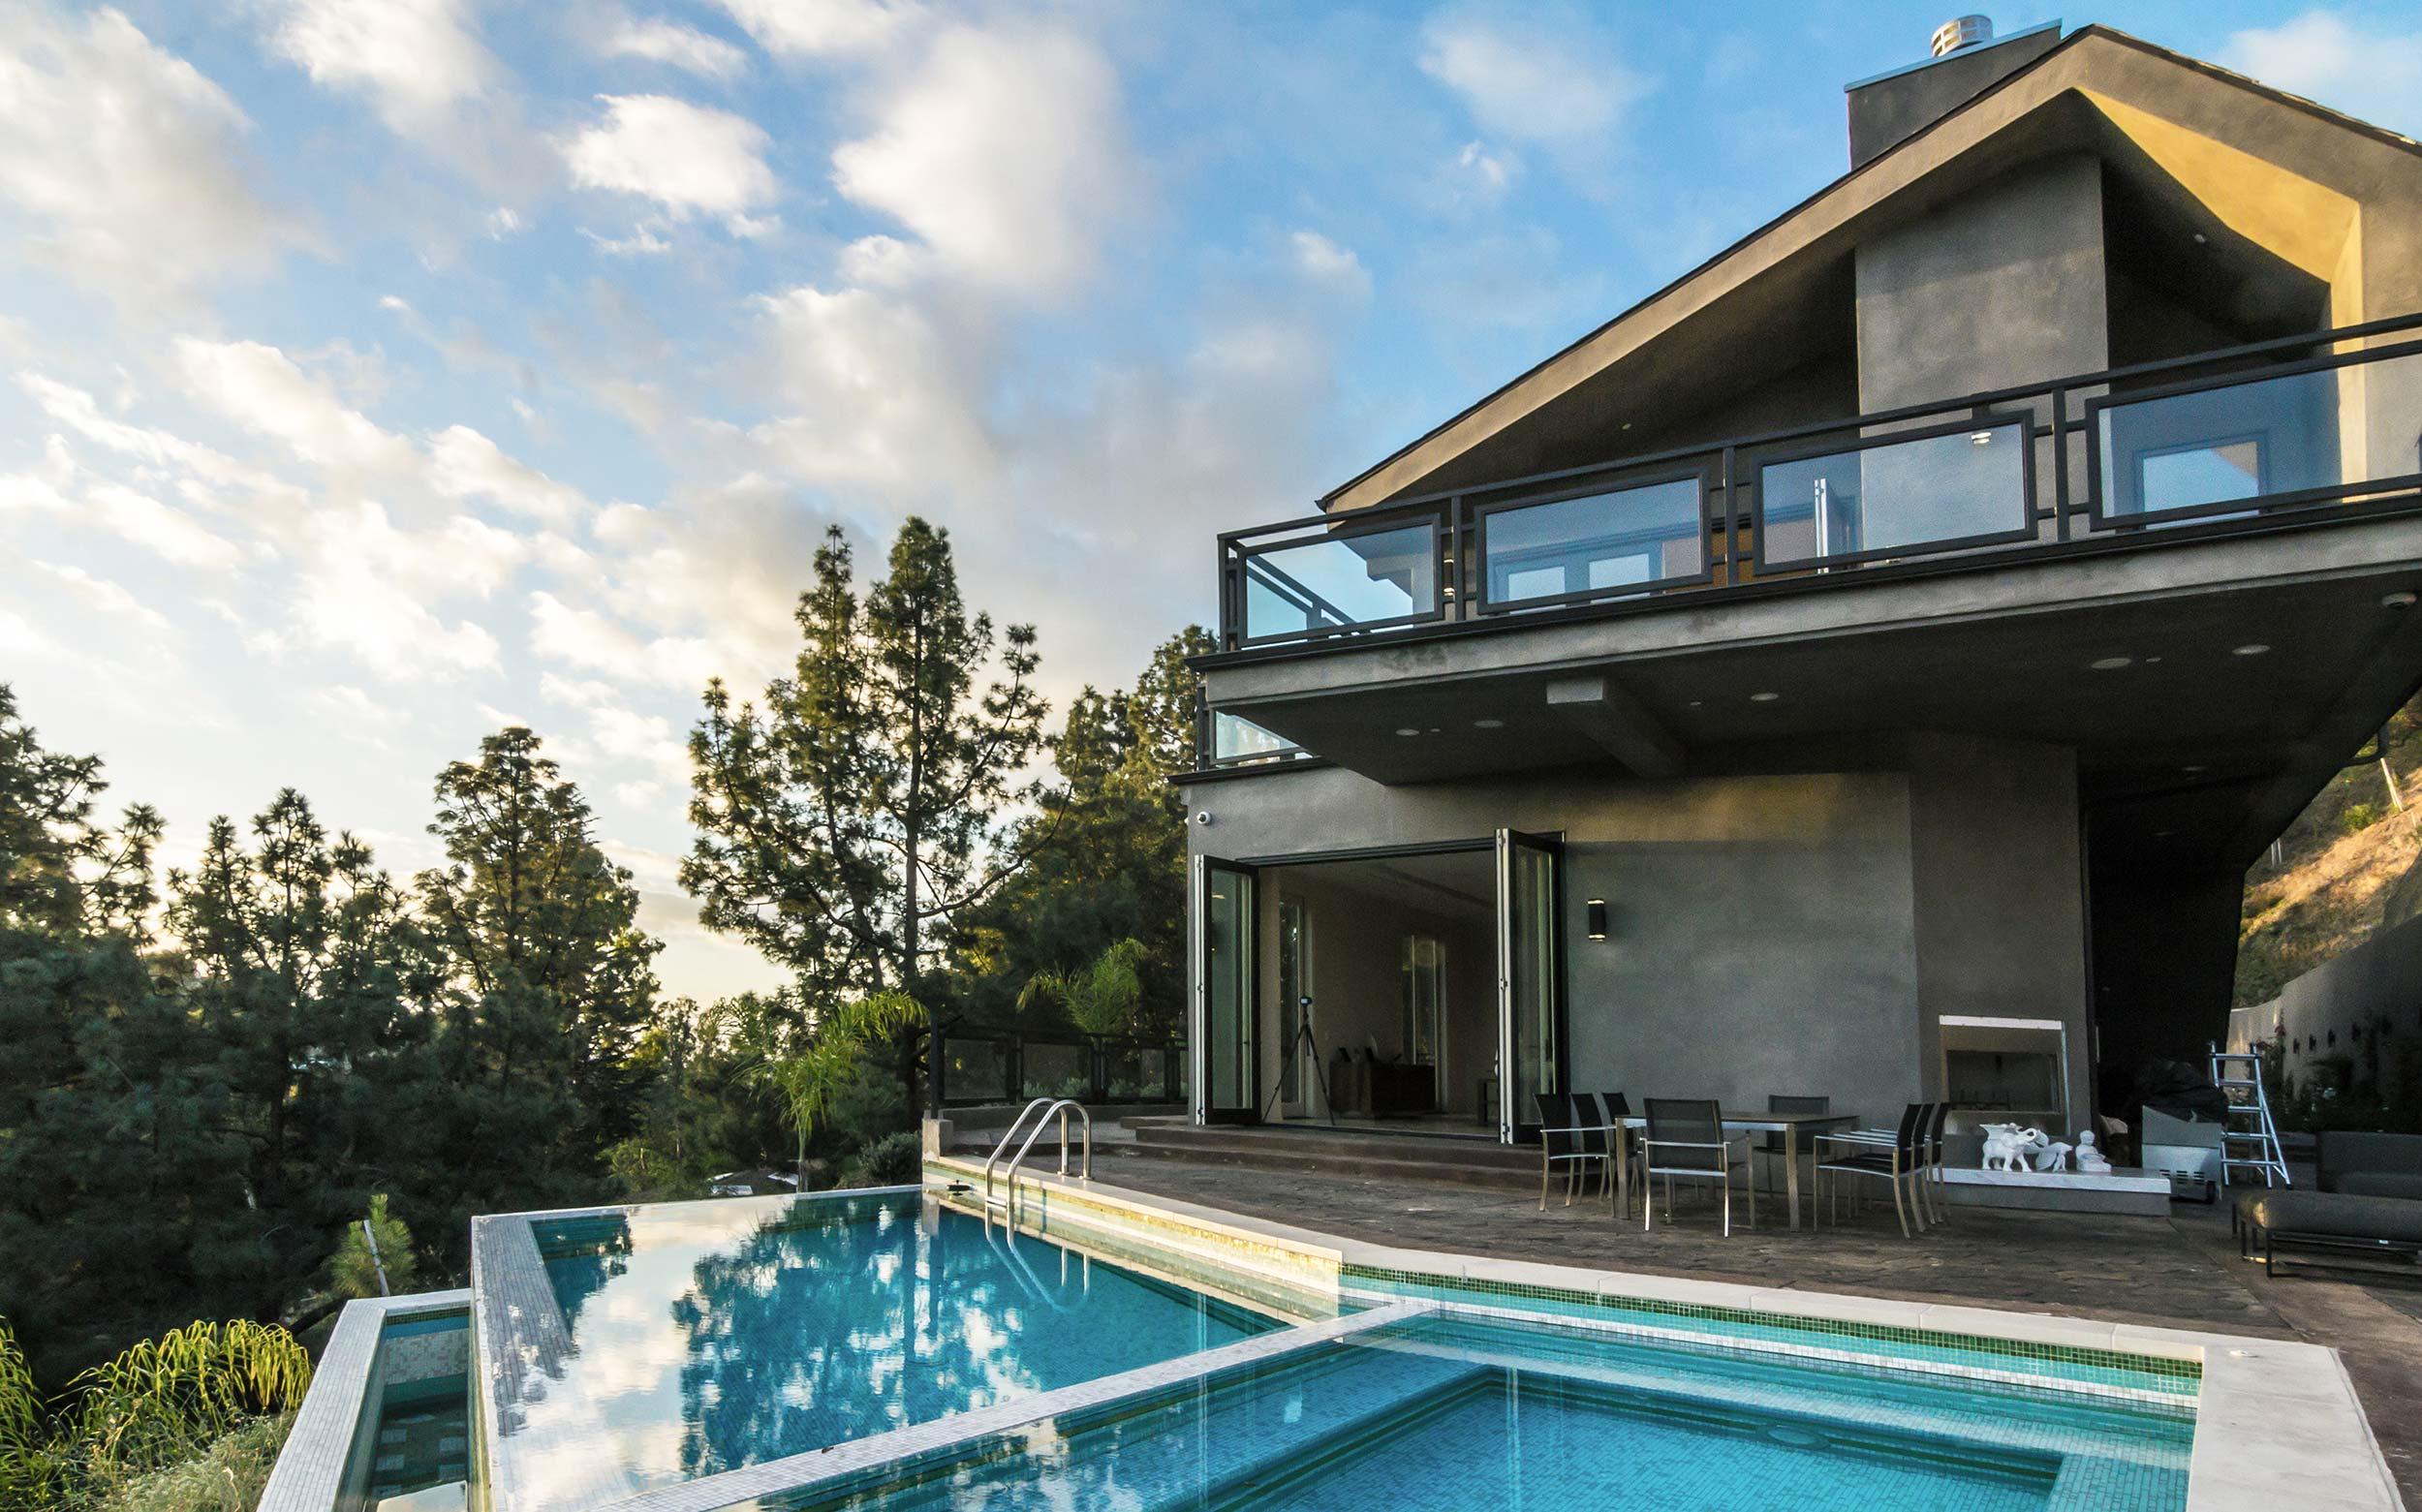 monte-cielo-house-archillusion-design-exterior-view.jpg